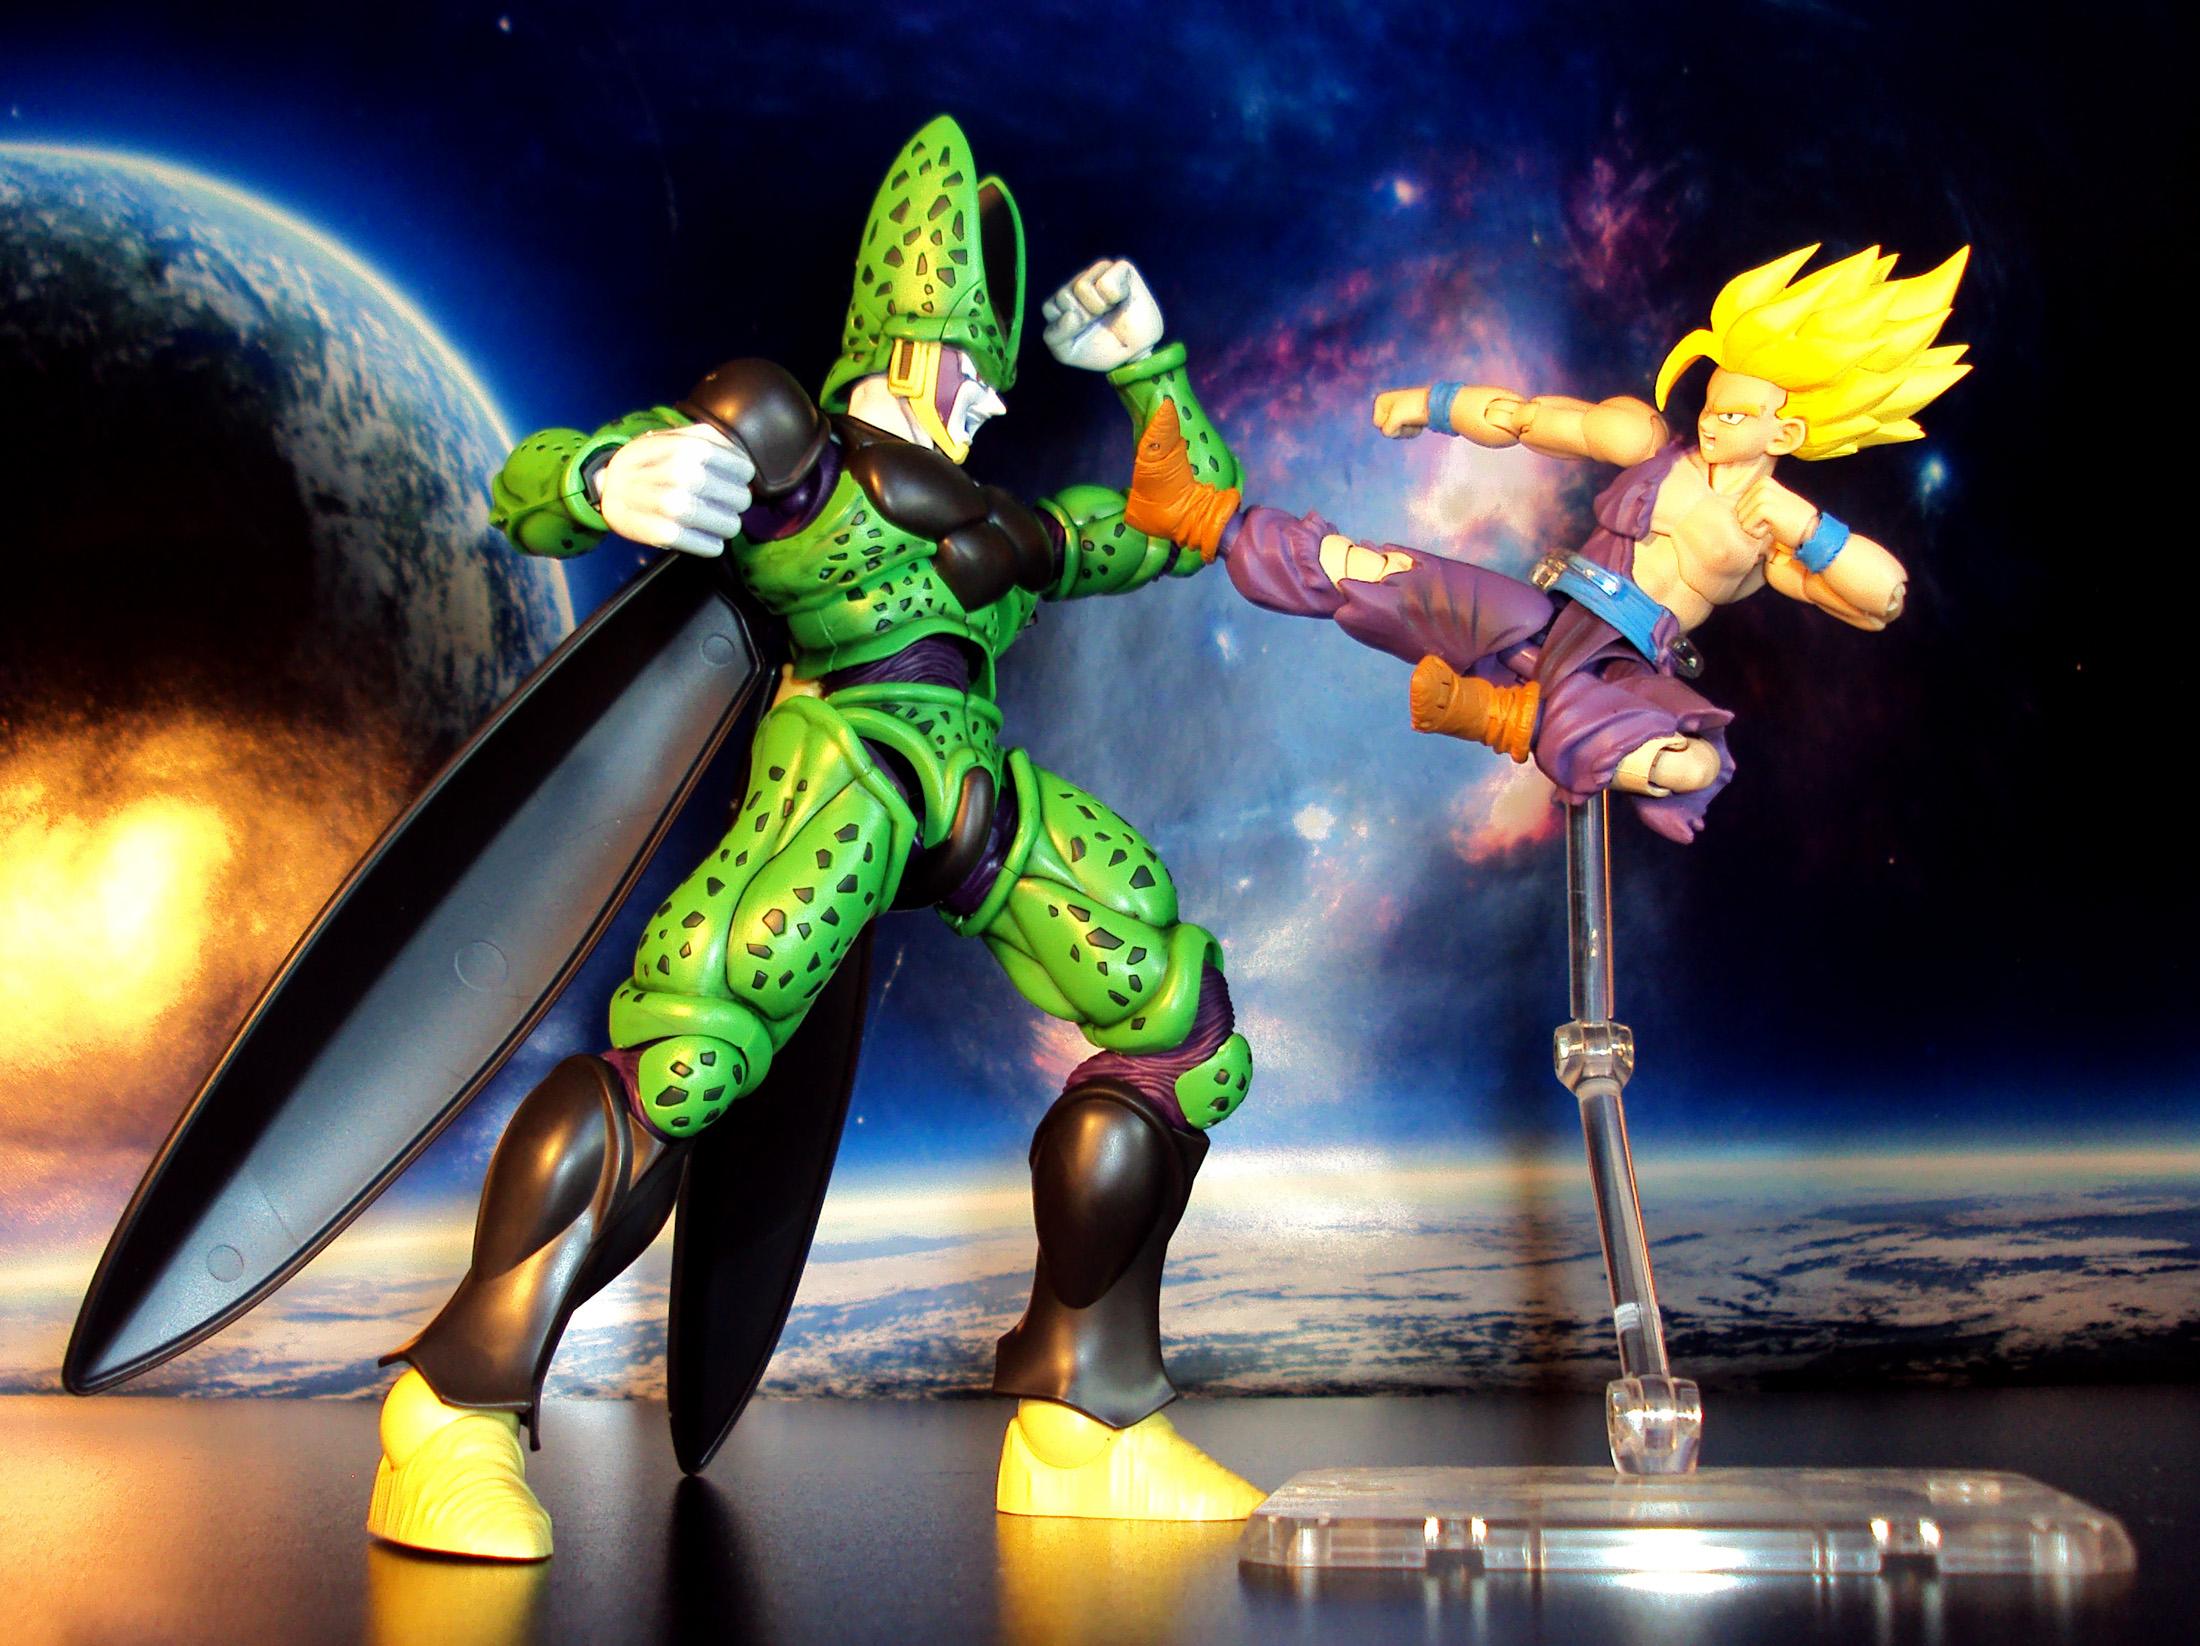 Goku Ssj Wallpaper Hd Bandai S H Figuarts Dragonball Z Teen Super Saiyan Son